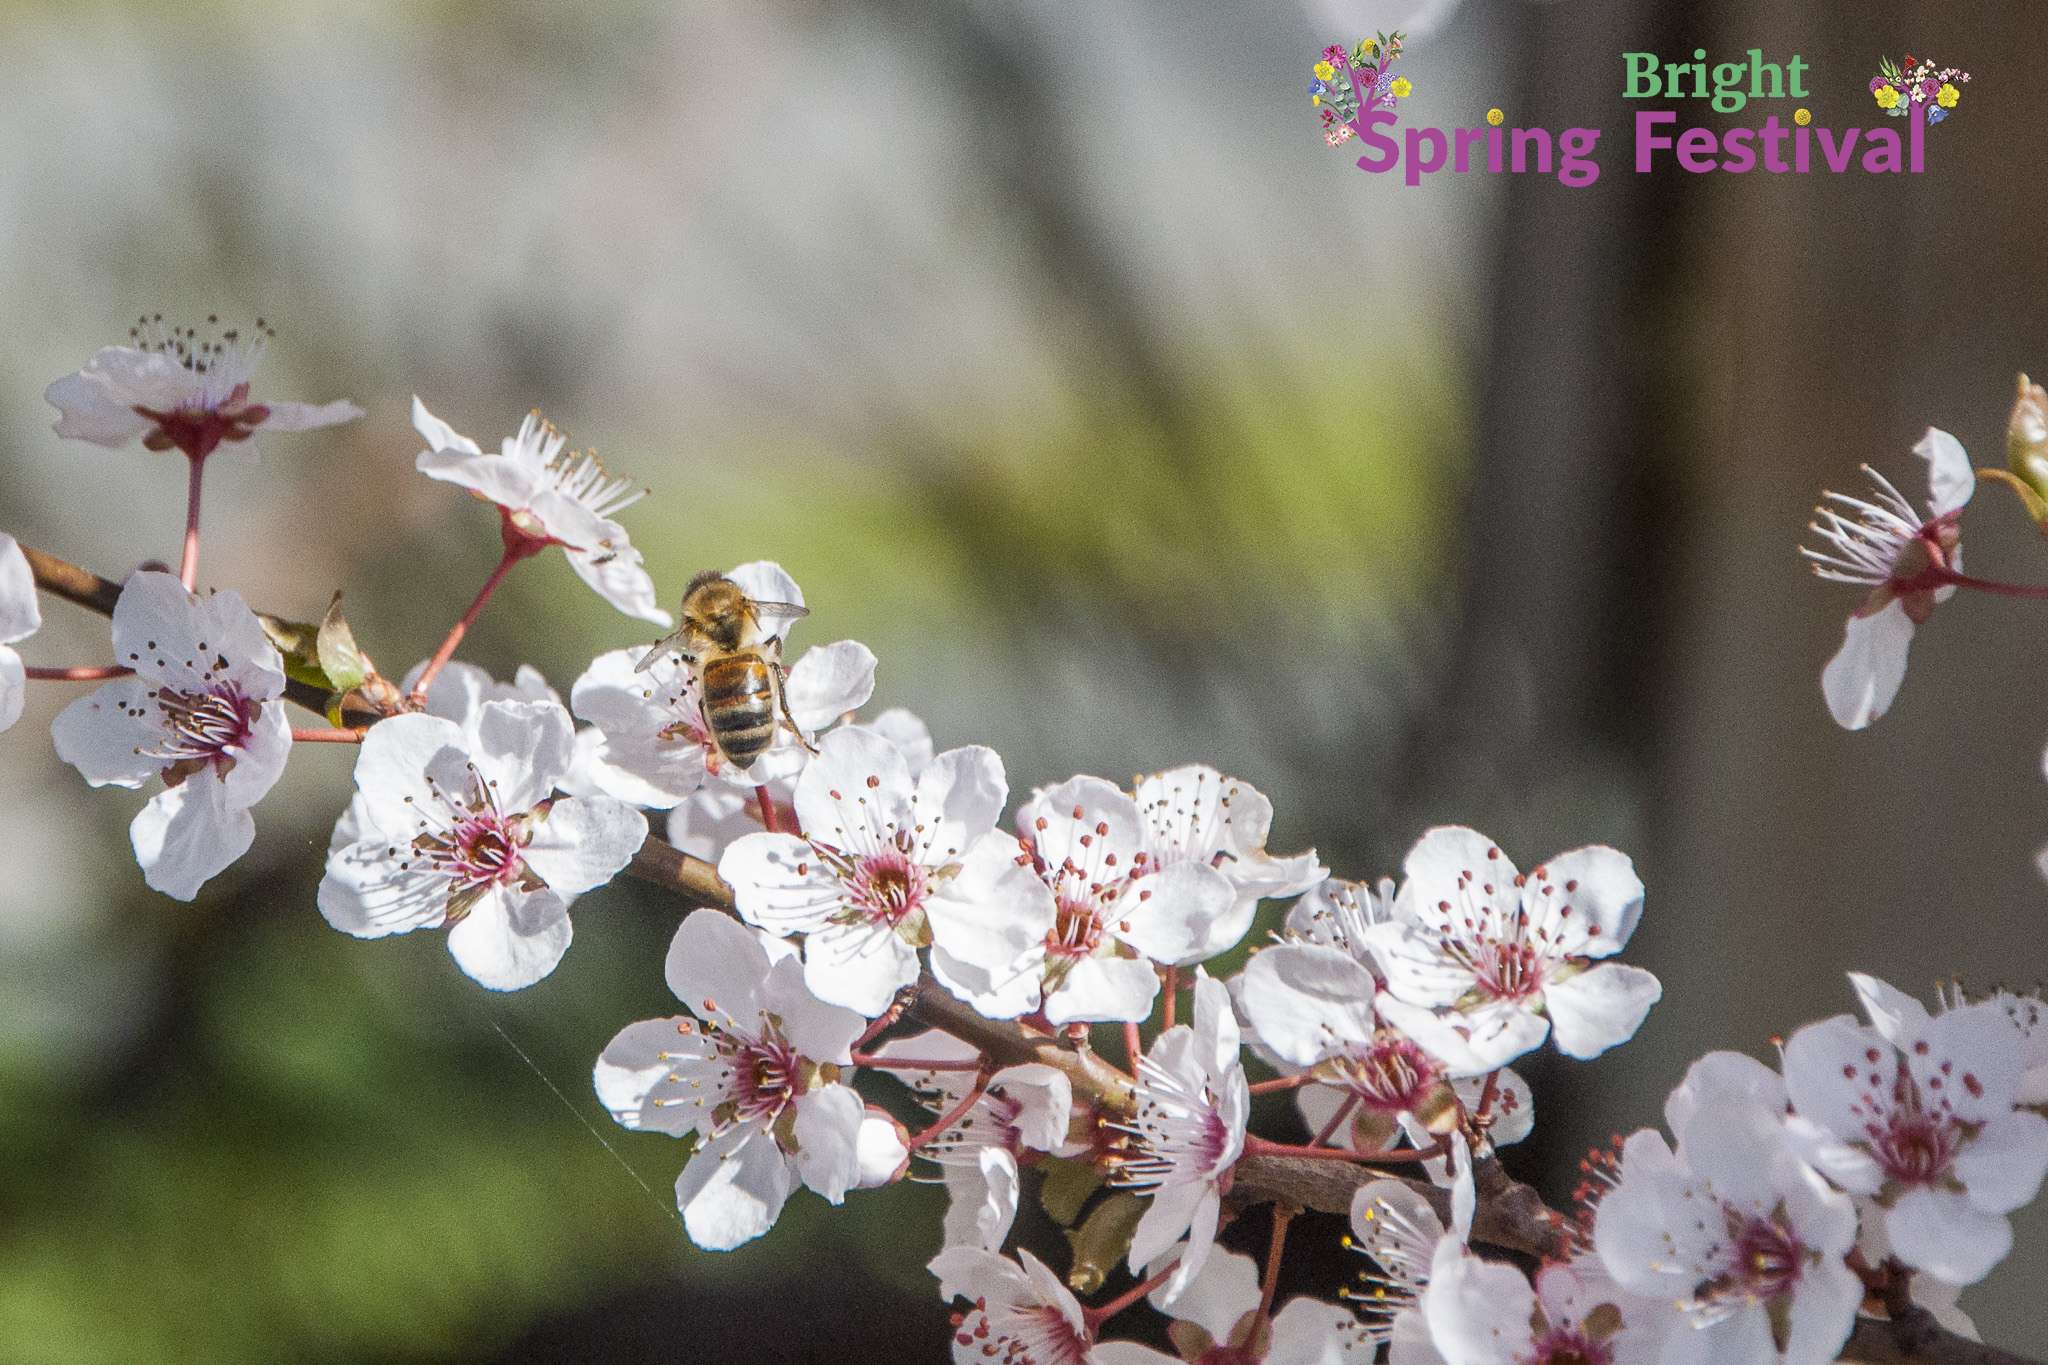 Brigh Spring Festival 1409 - 007